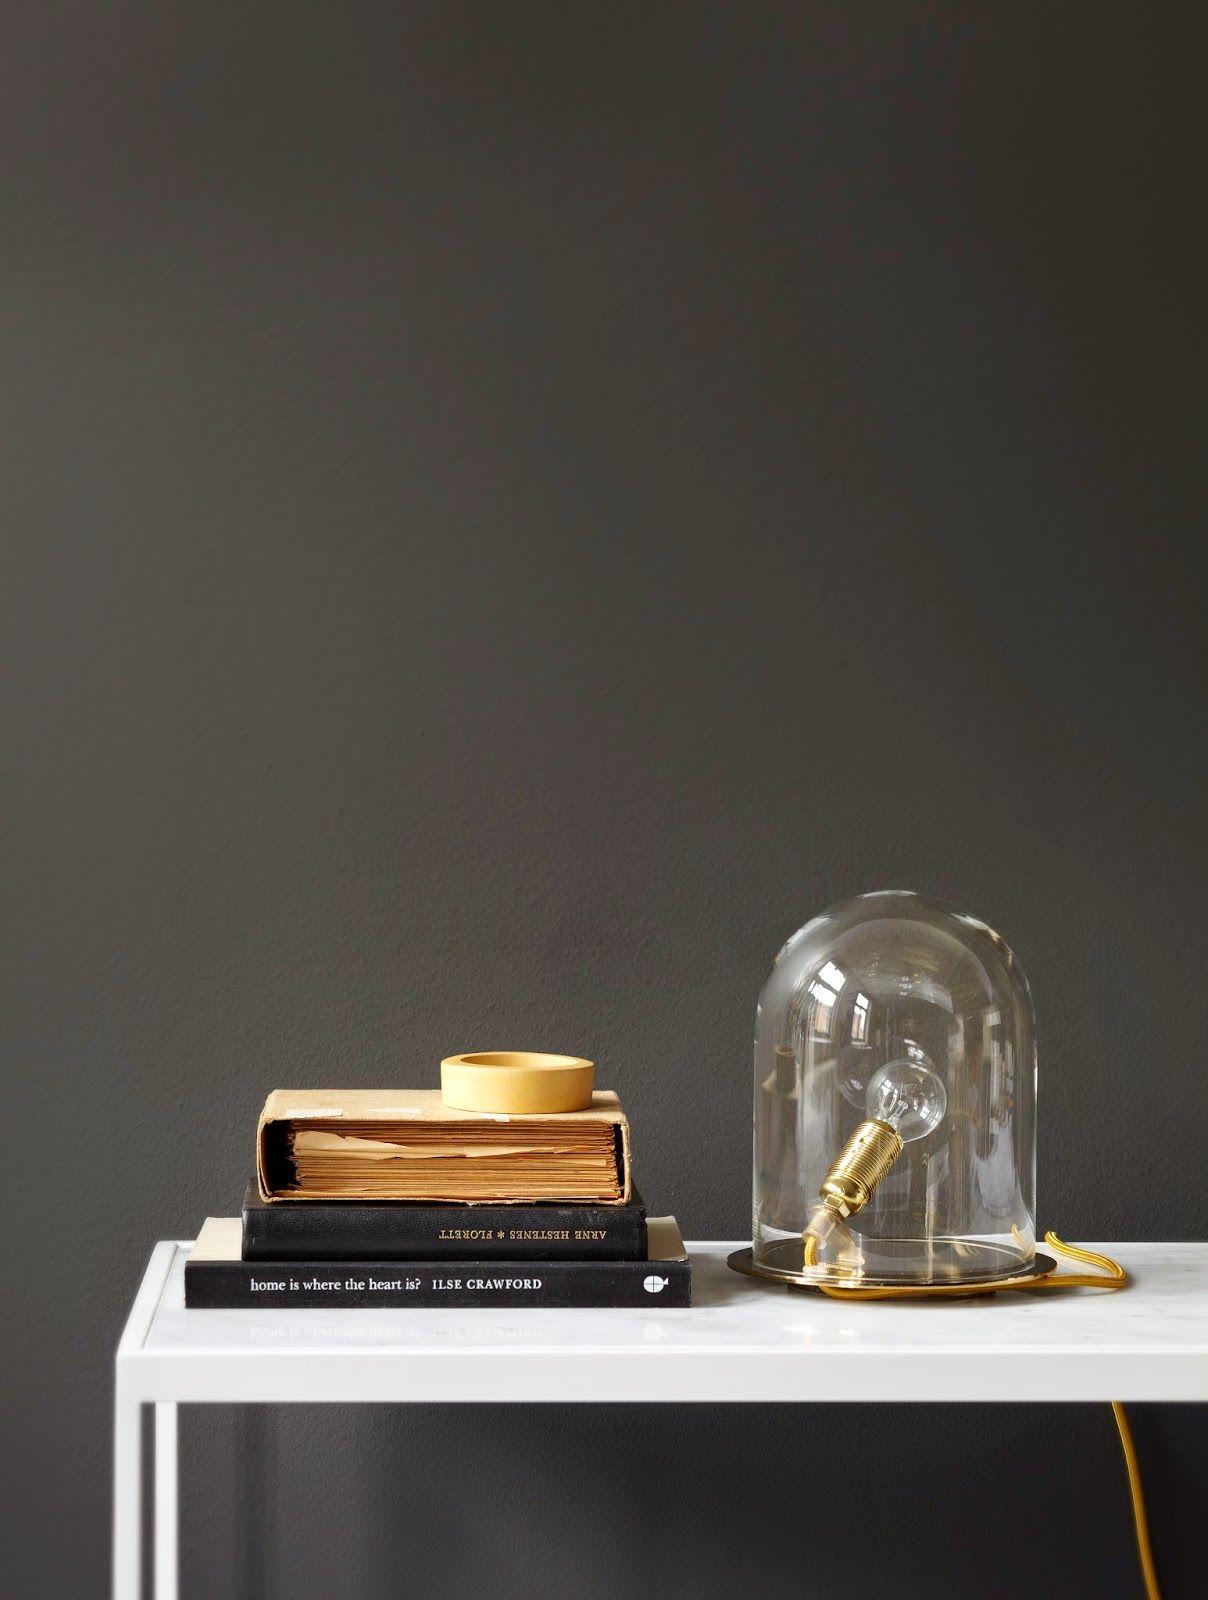 Jotun my home Fenomastic 9938 | Gold - styling | Jotun lady